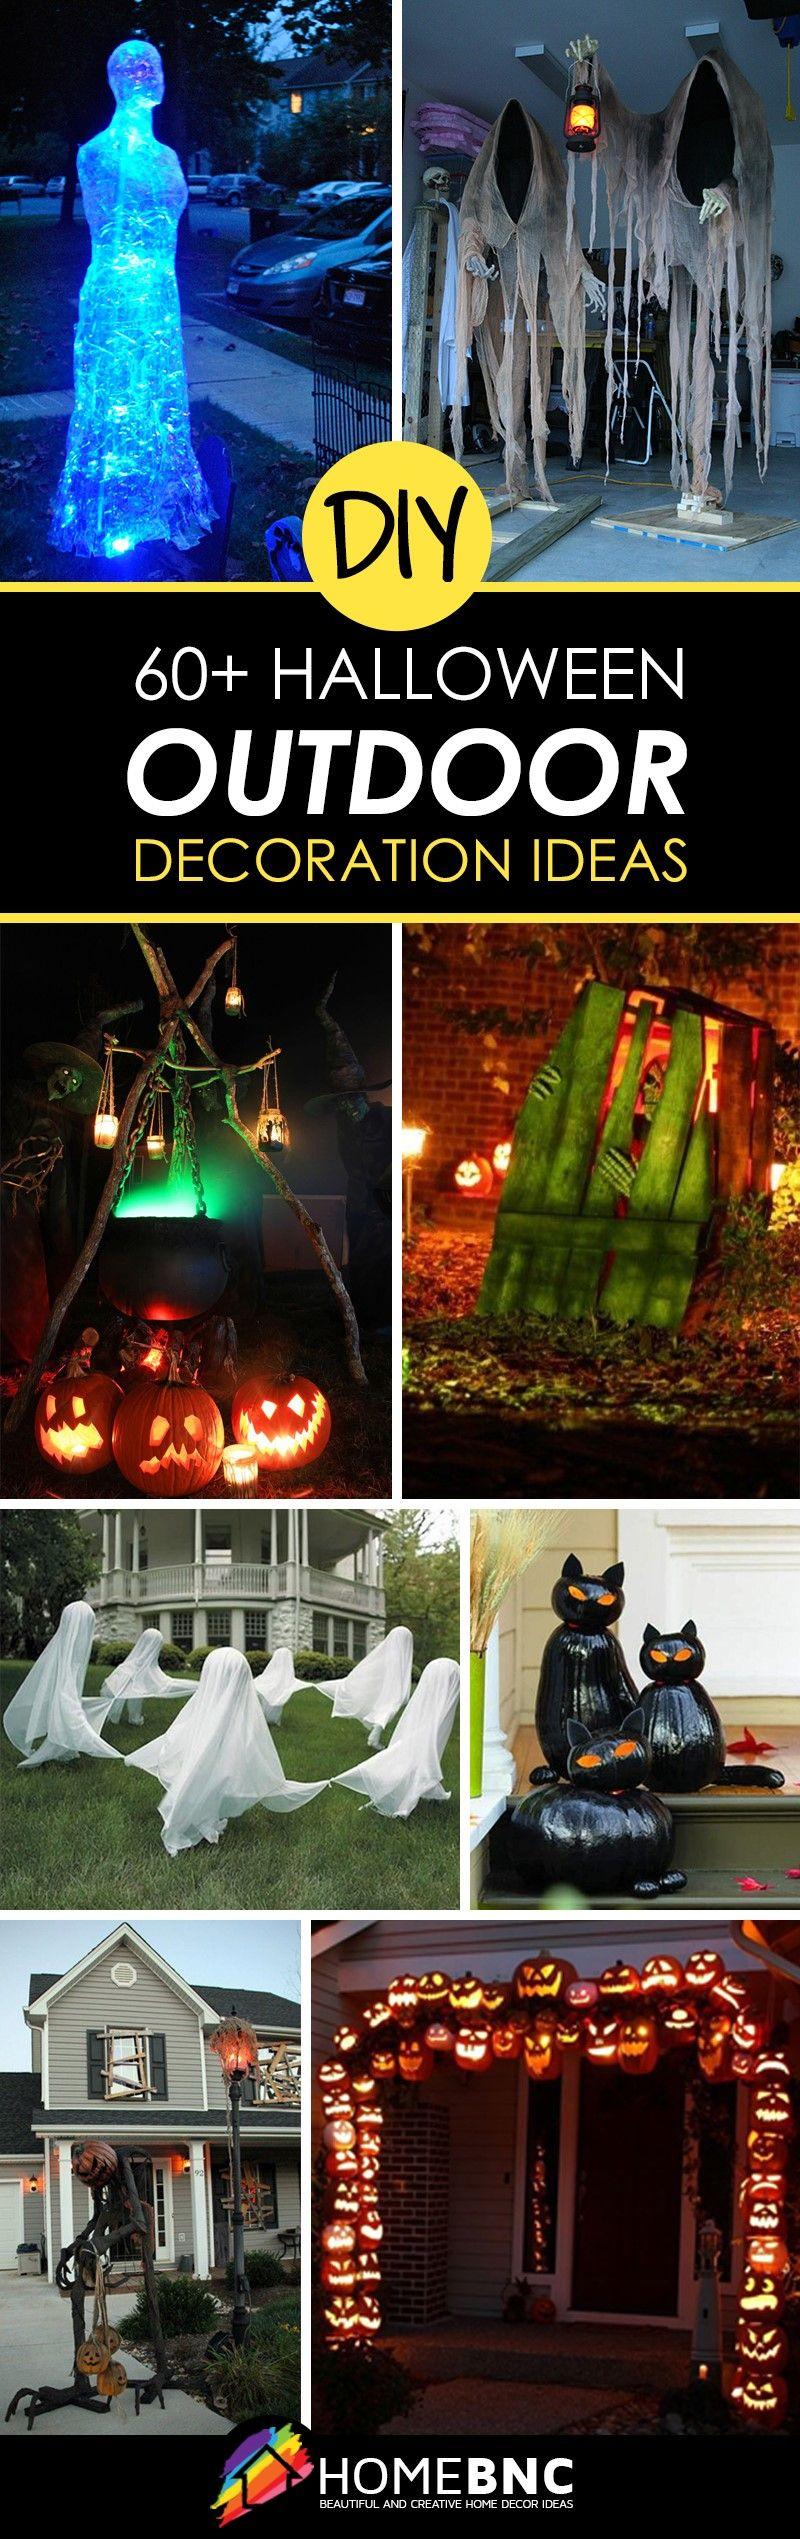 Halloween Decorations Asda Halloween Decorations Australia